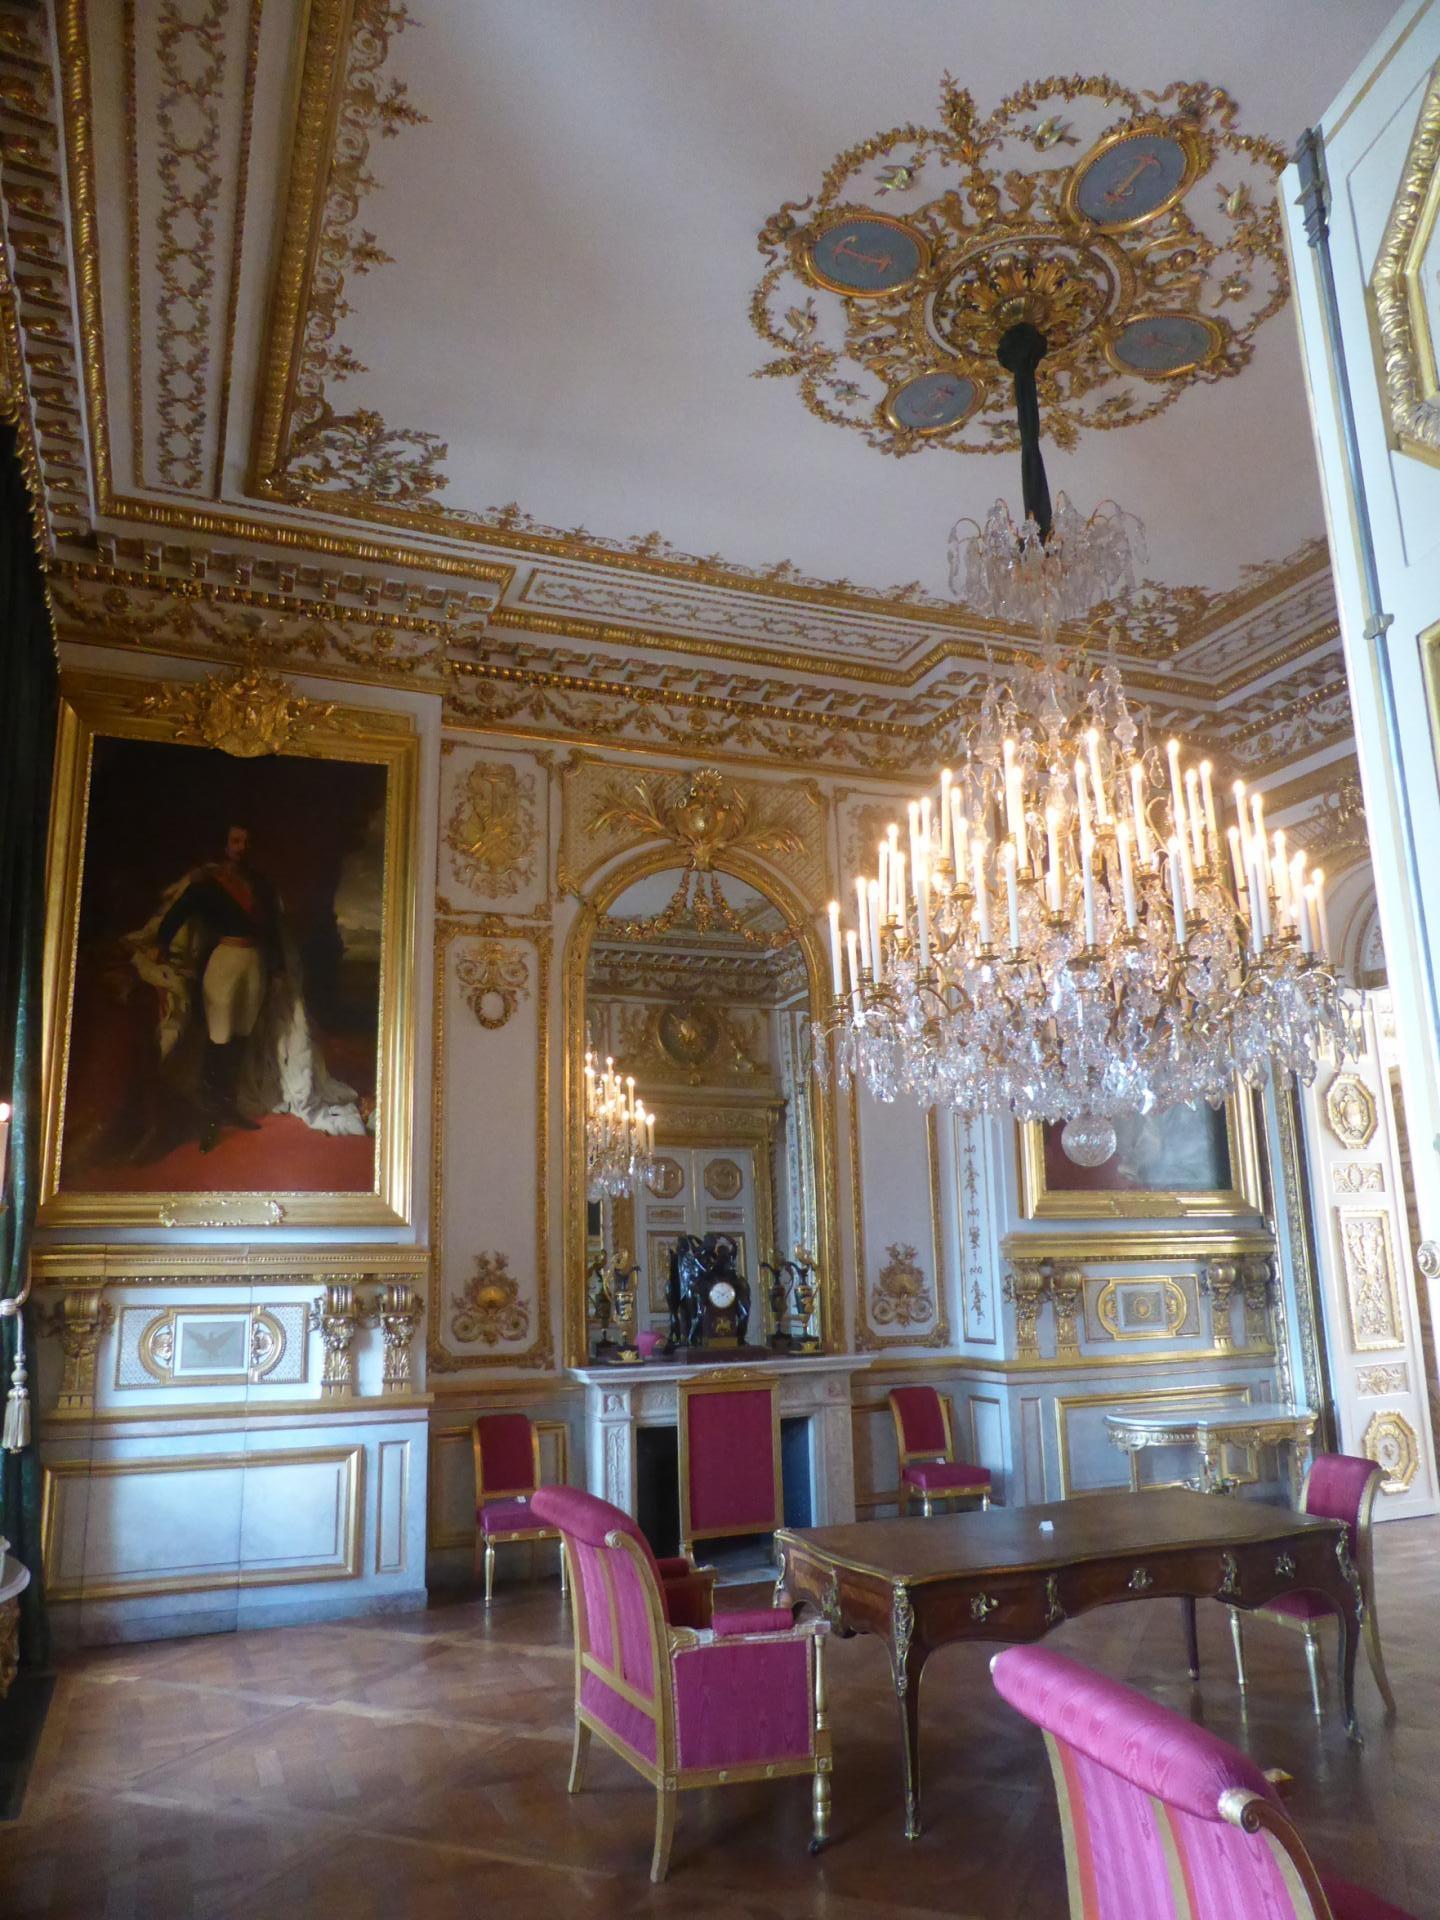 Salon Second Empire sur la place de la Concorde, cl. Ph. Cachau